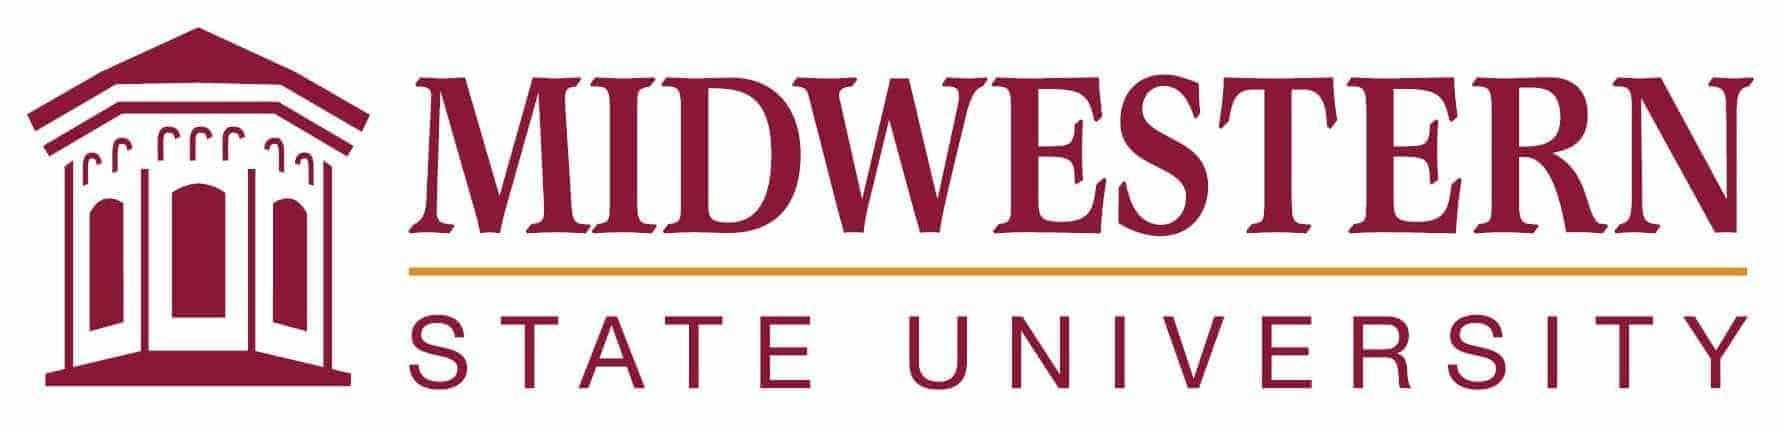 midwestern state university logo 7485